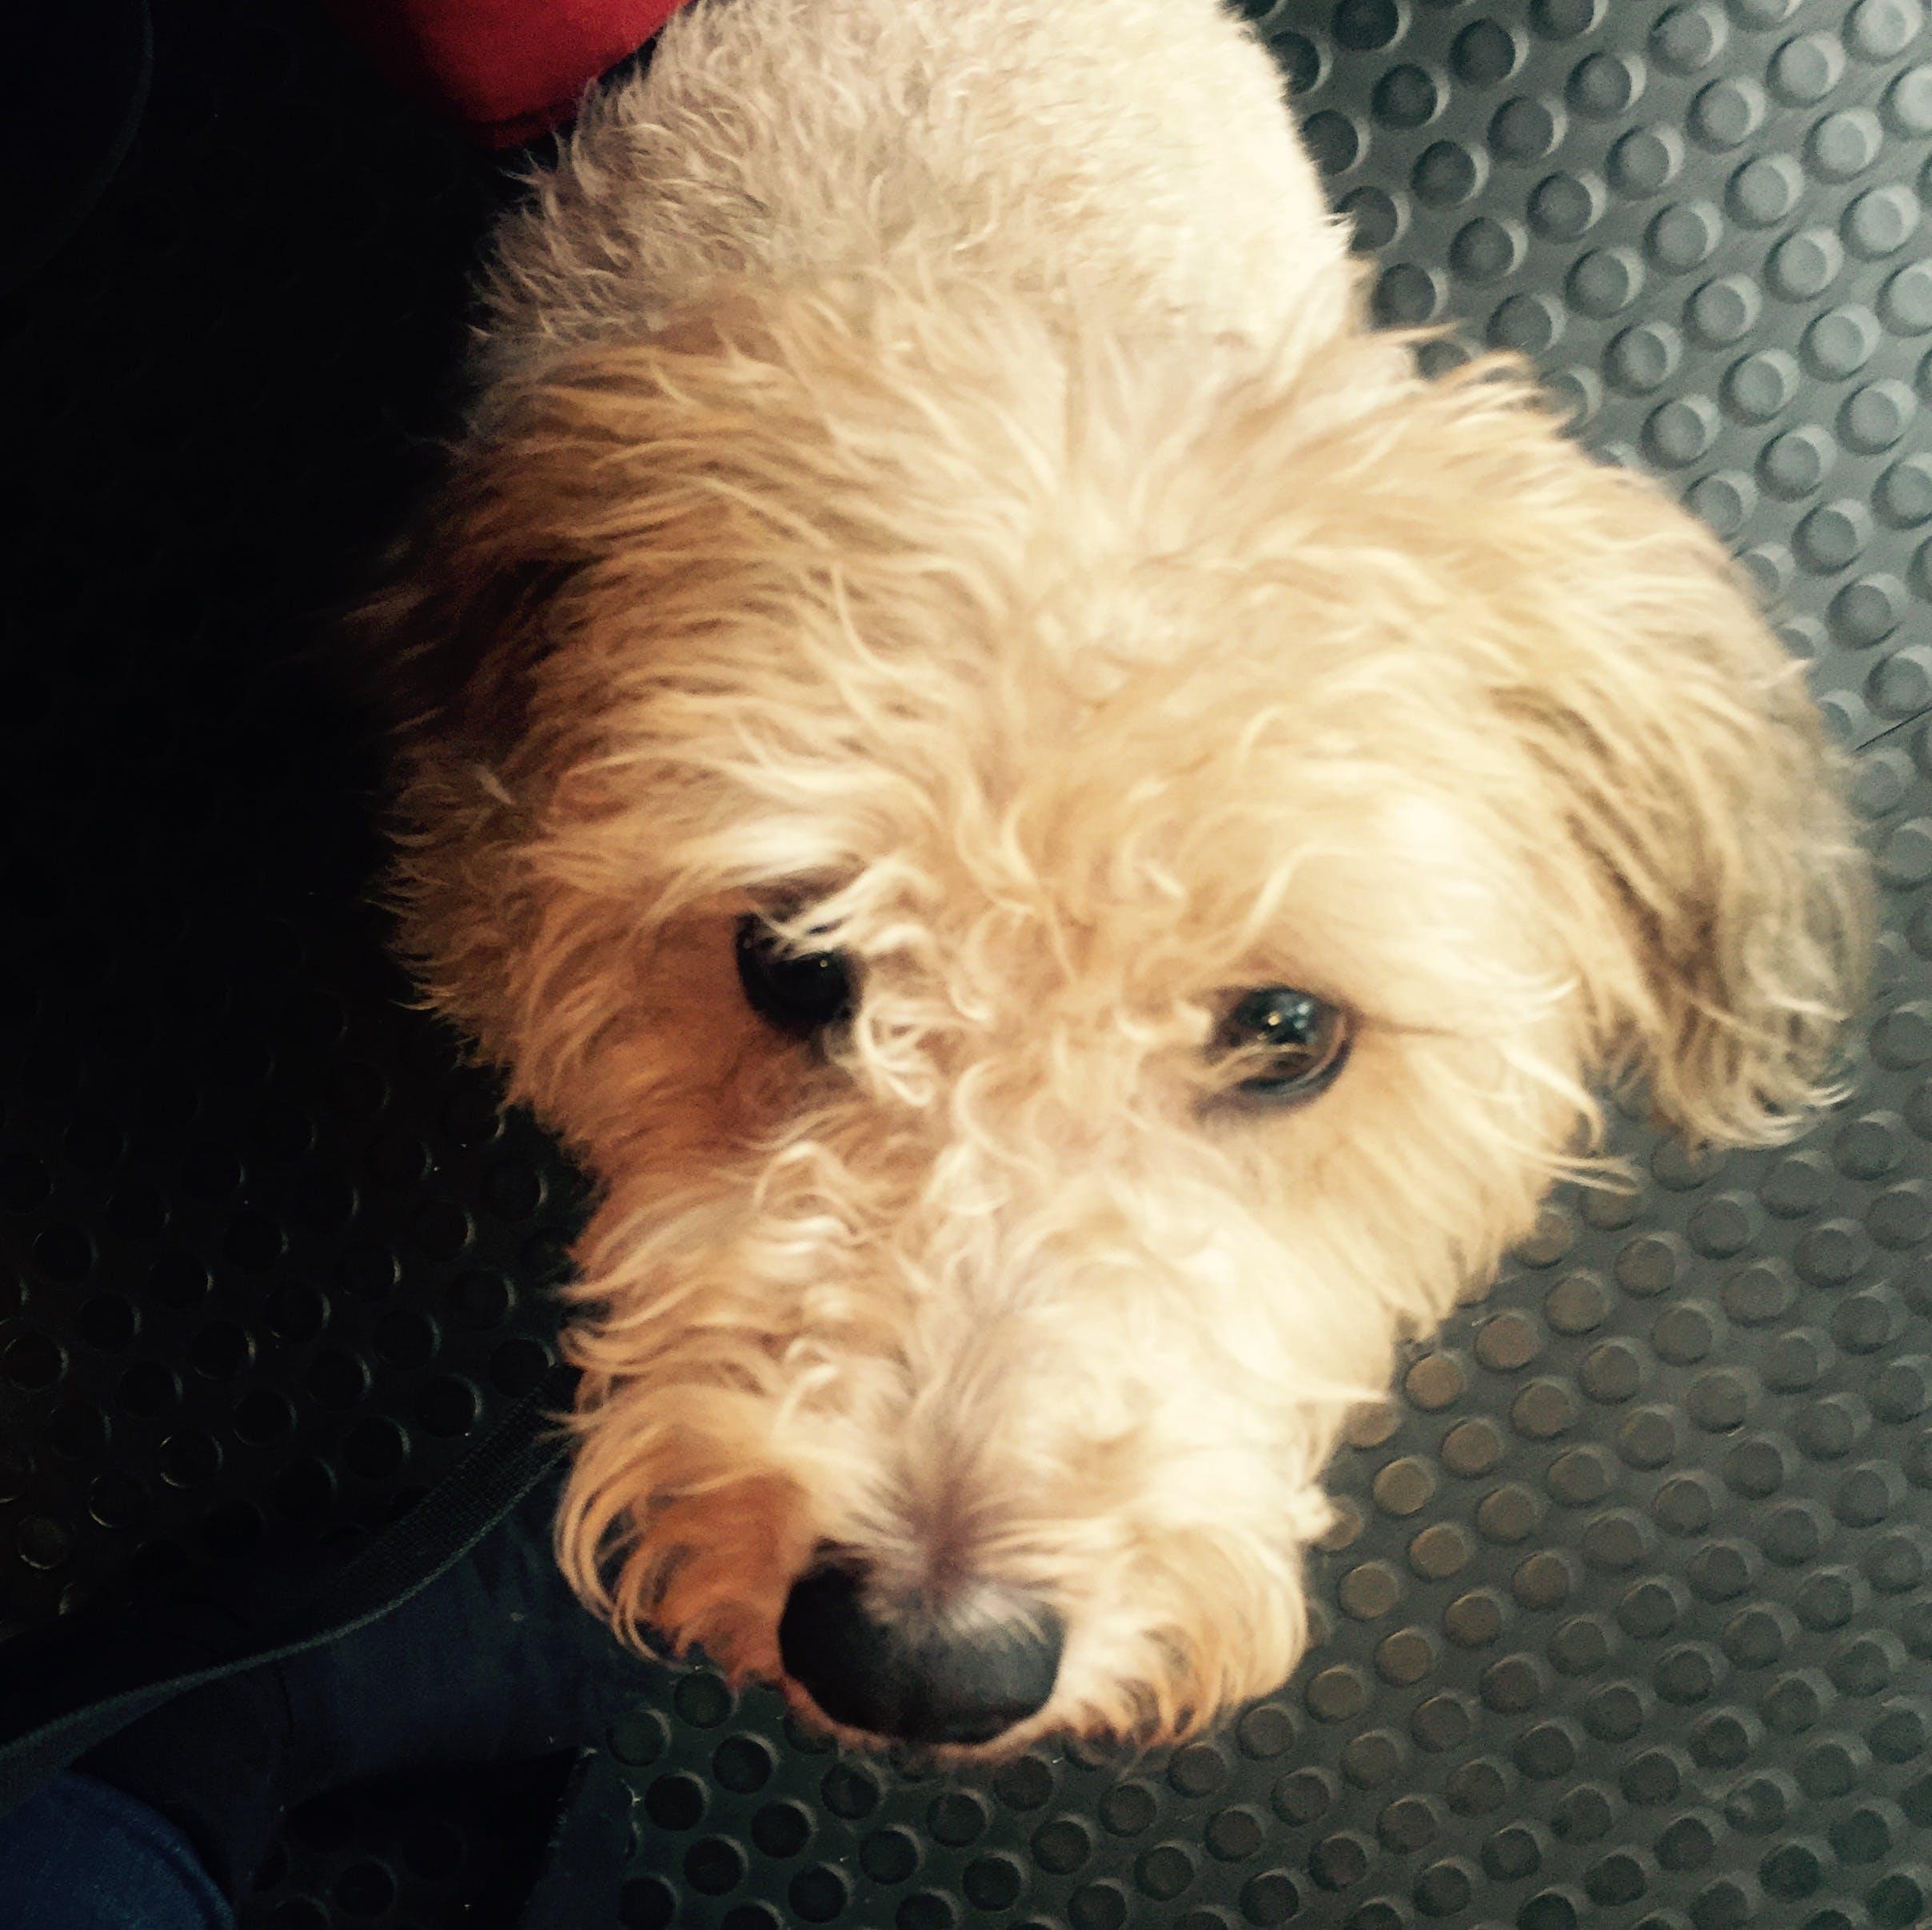 Free stock photo of dog, cute animals, dog face